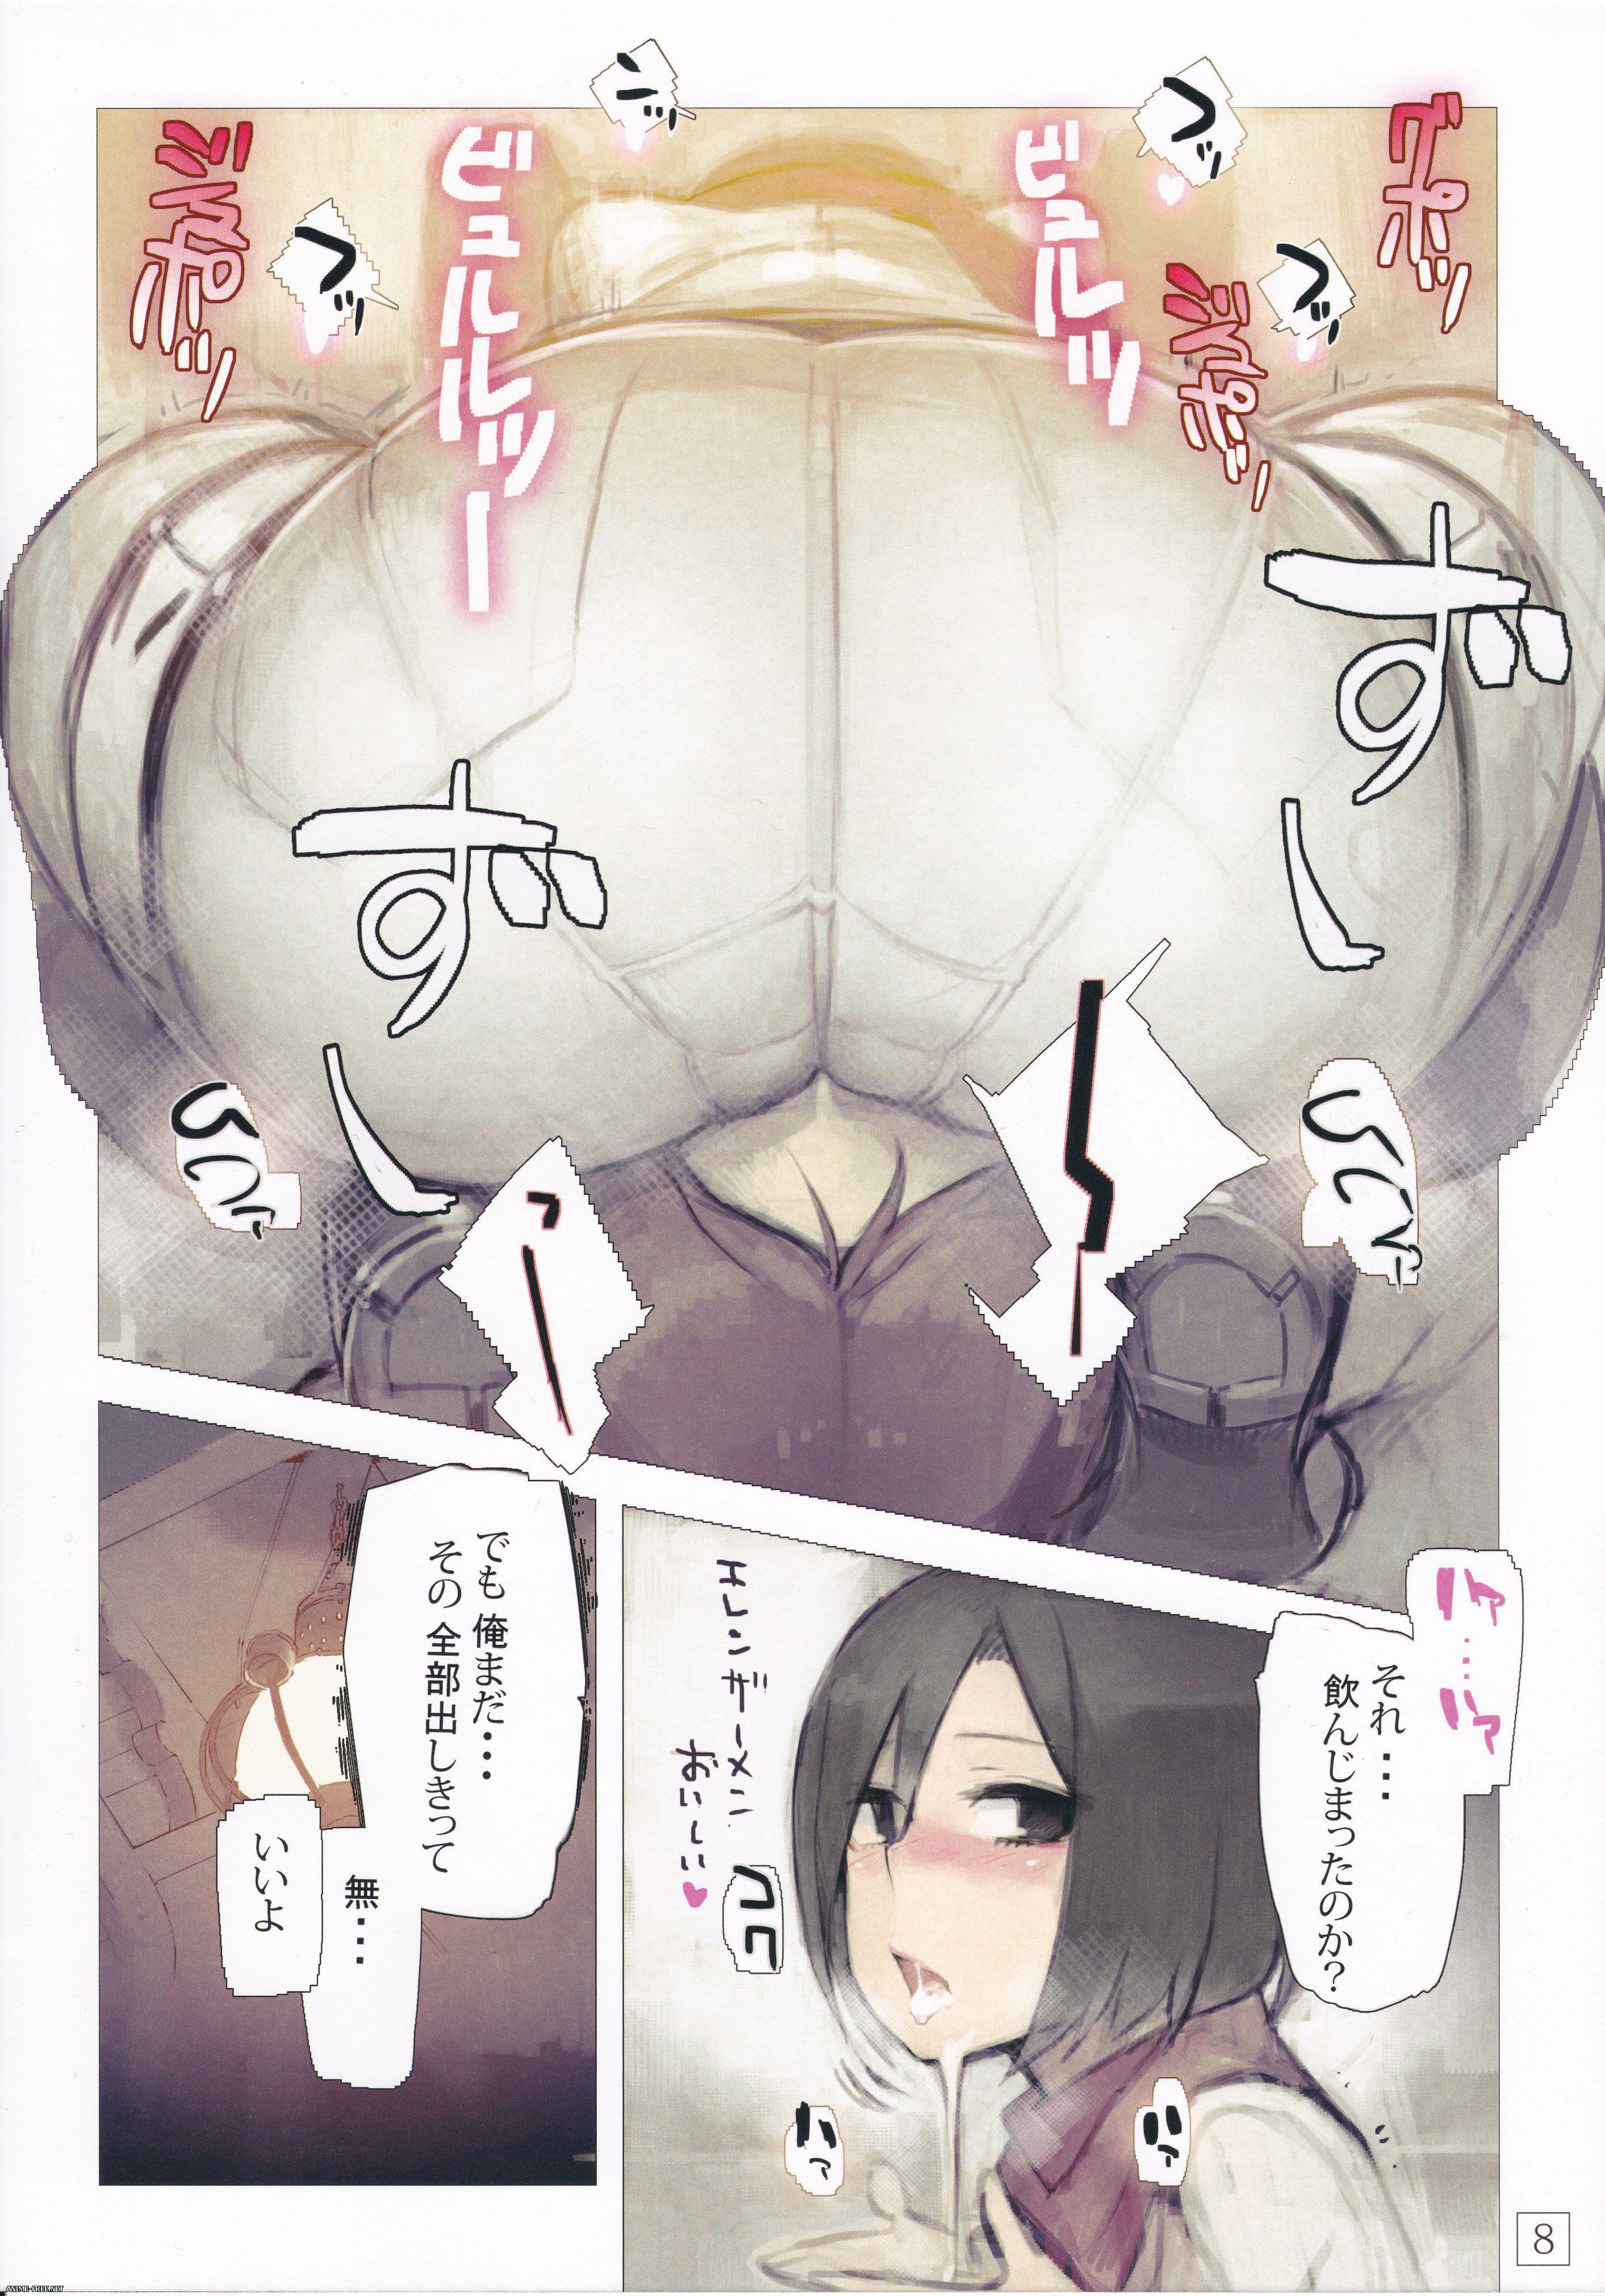 Shingeki no Kyojin Doujins Collection / Attack on Titan / Вторжение гигантов - Коллекция Додзинси [Cen] [ENG,JAP,RUS] Manga Hentai